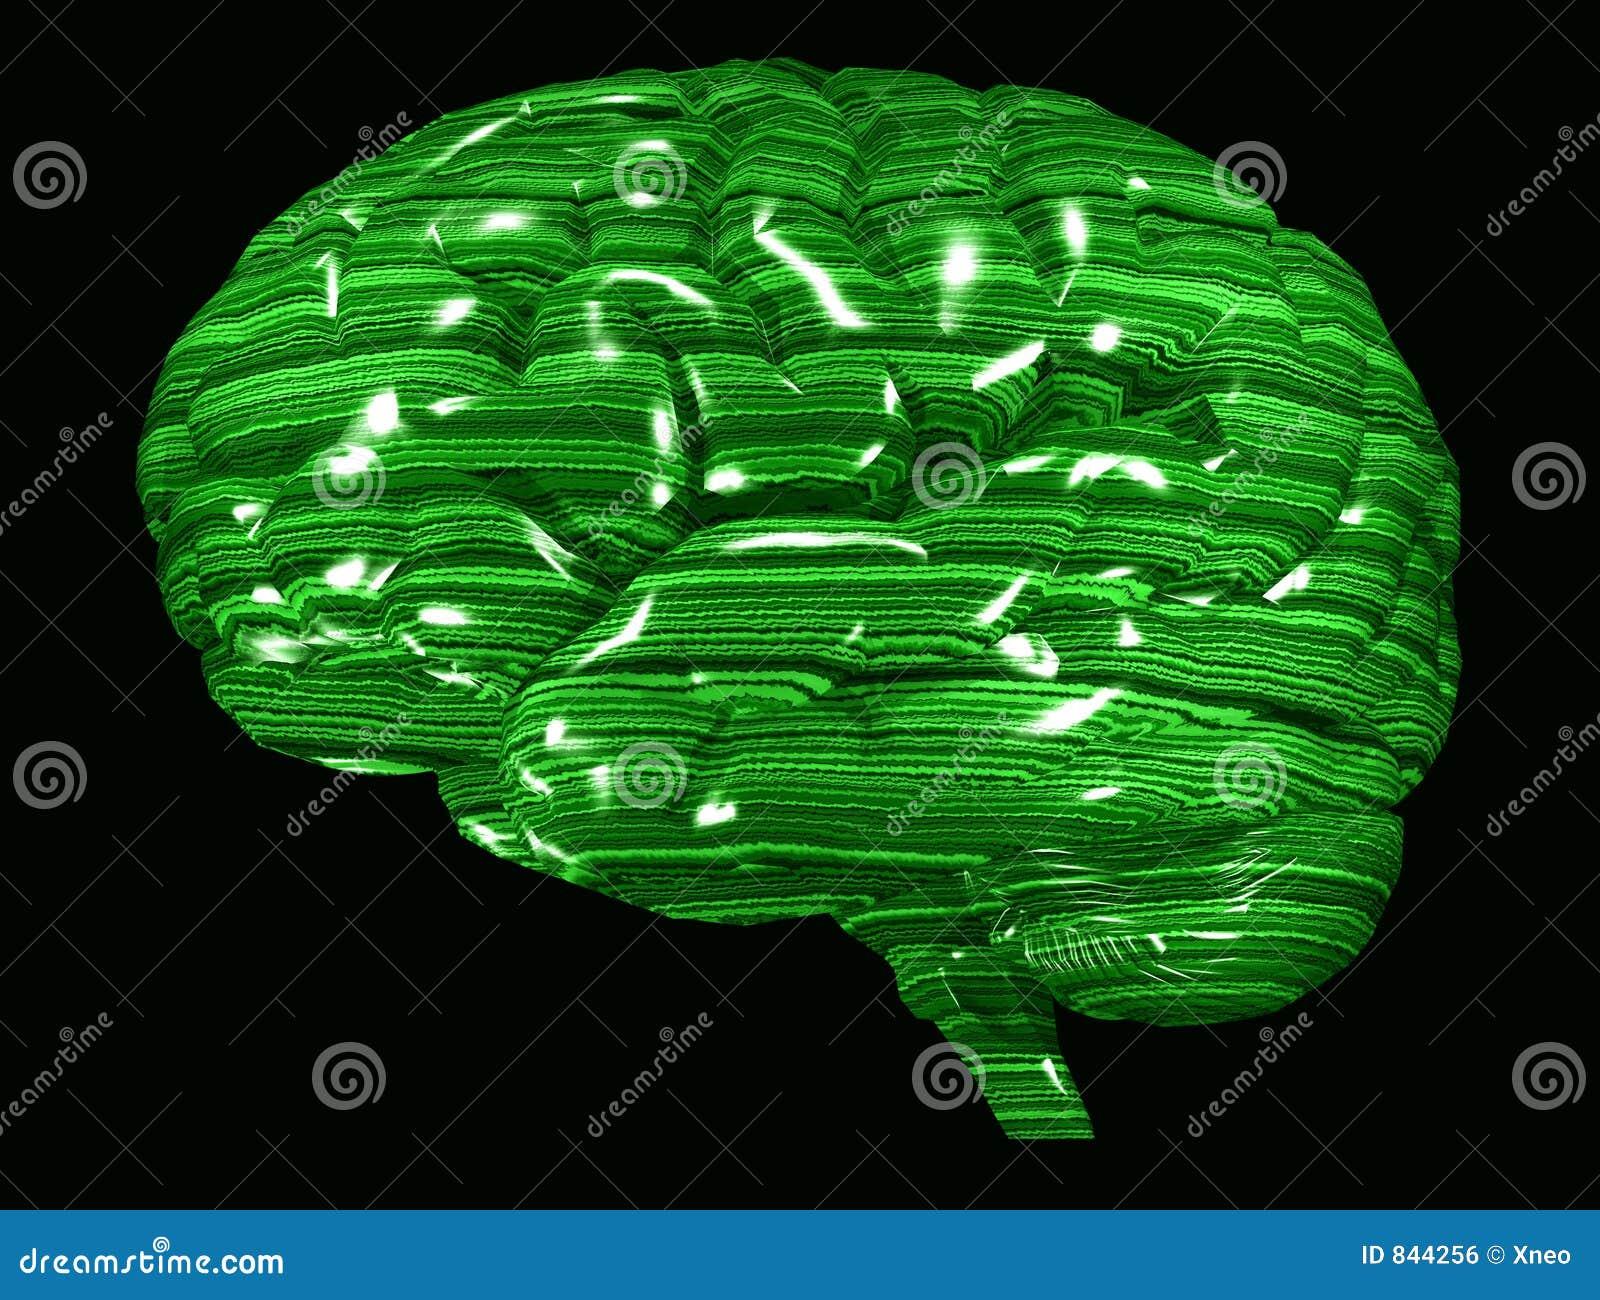 Matrix Green Brain